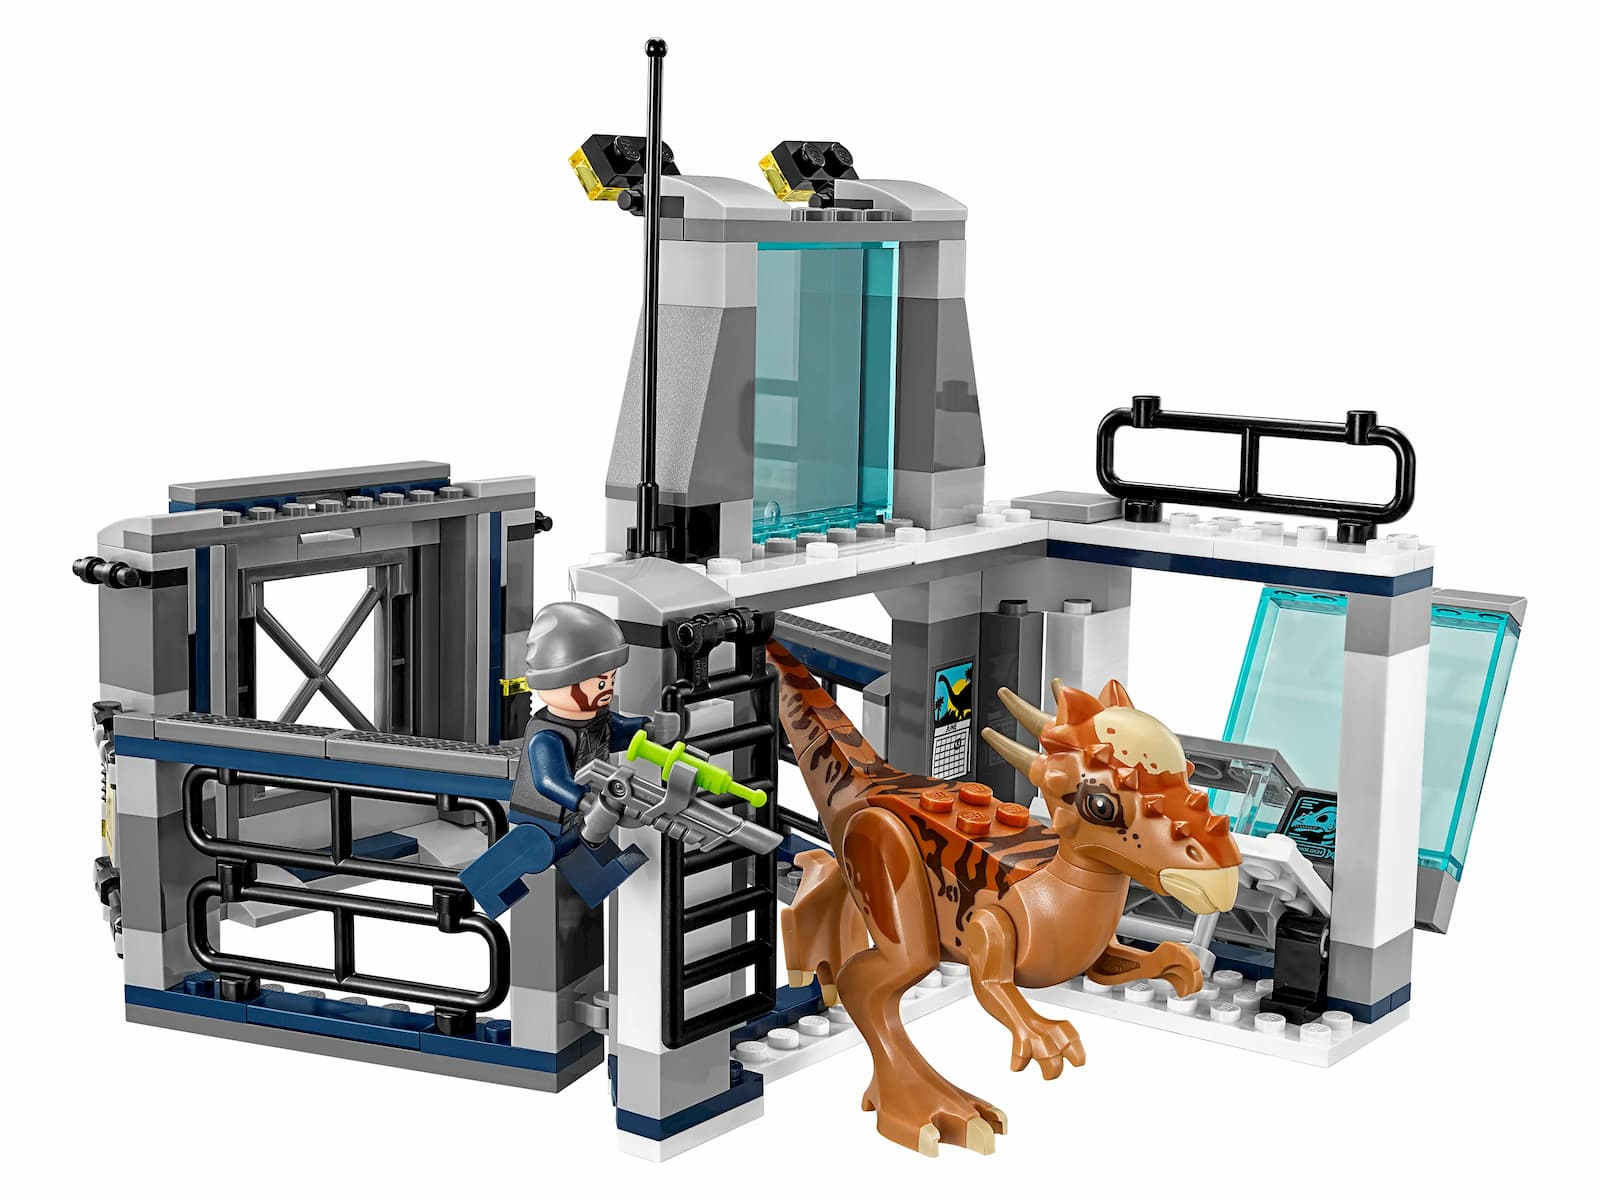 Конструктор Bl «Побег Стигимолоха из лаборатории» 10922 (Jurassic World 75927) / 234 детали